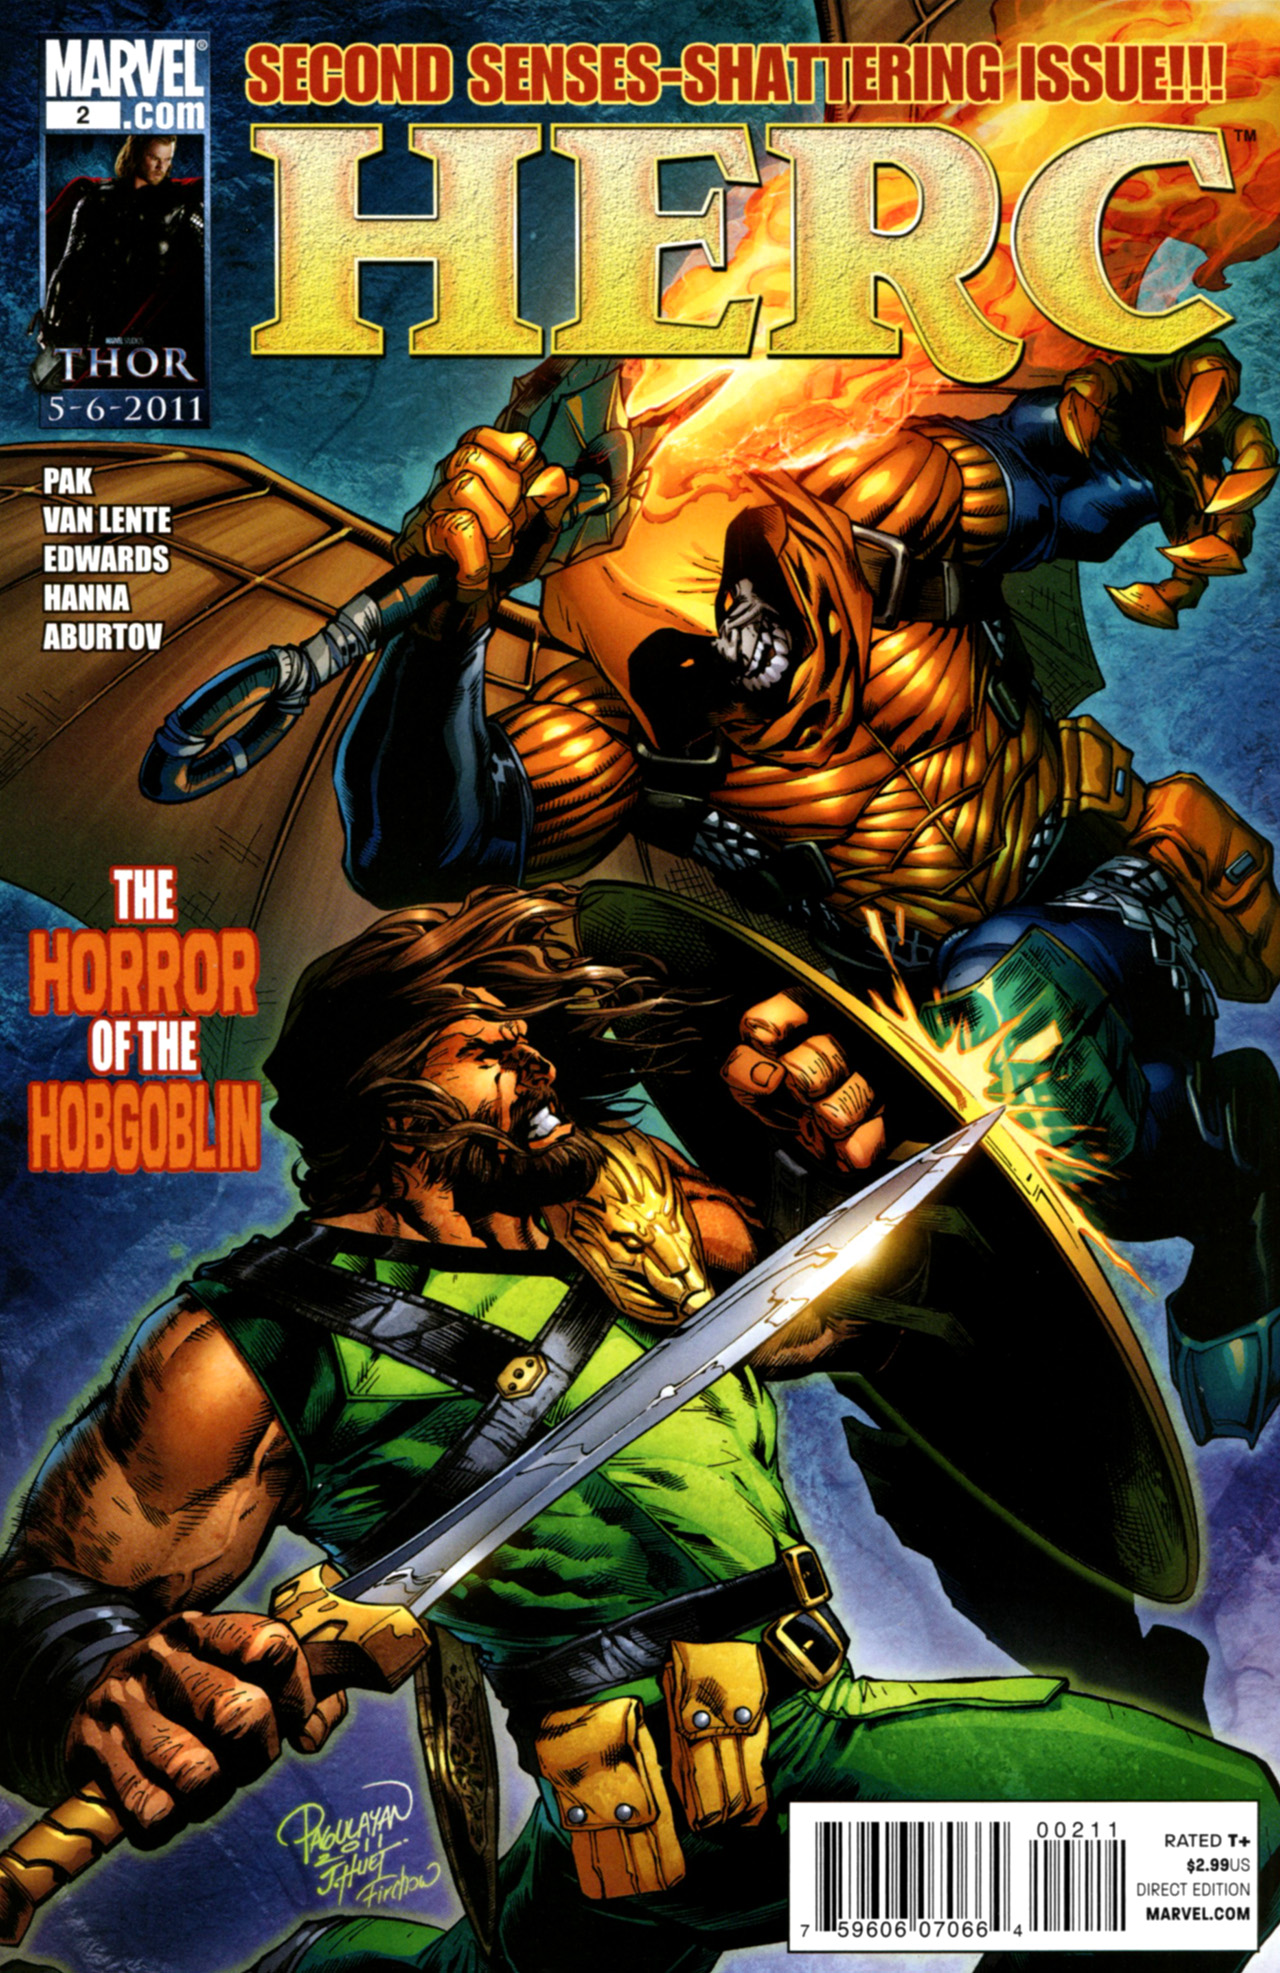 Cover d'Herc #2